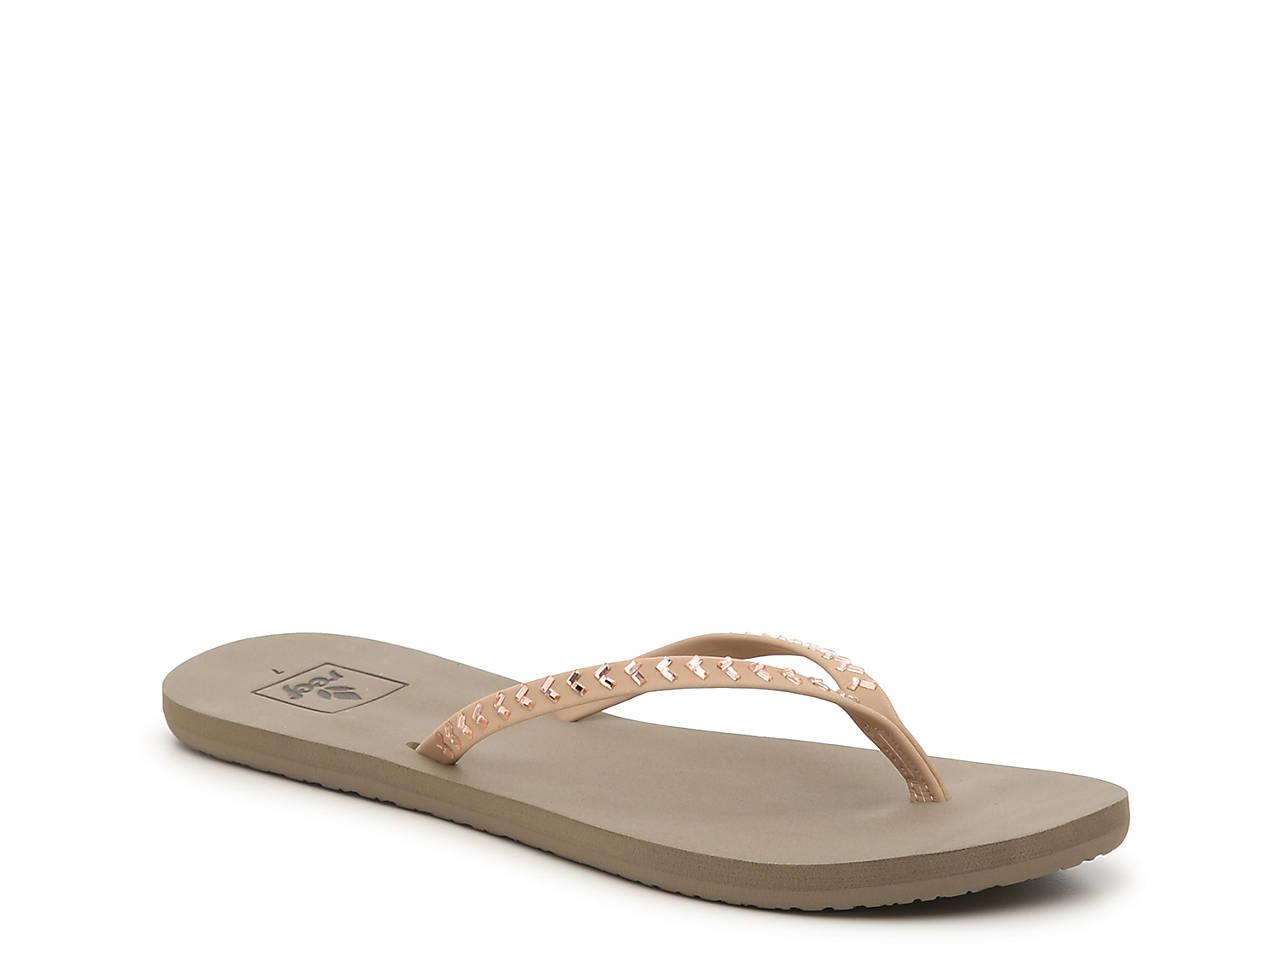 bfa2be3472db Reef Bliss Embellish Flip Flop Men s Shoes